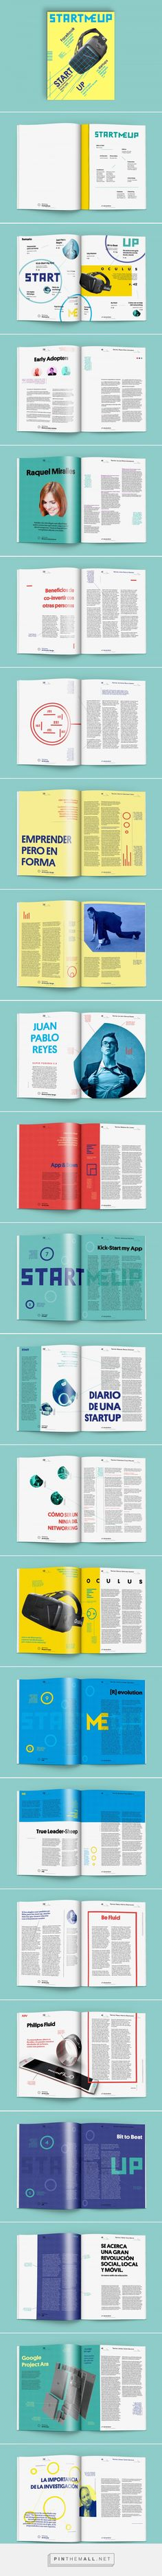 StartMeUp Mag Look & Feel on Behance - created via https://pinthemall.net